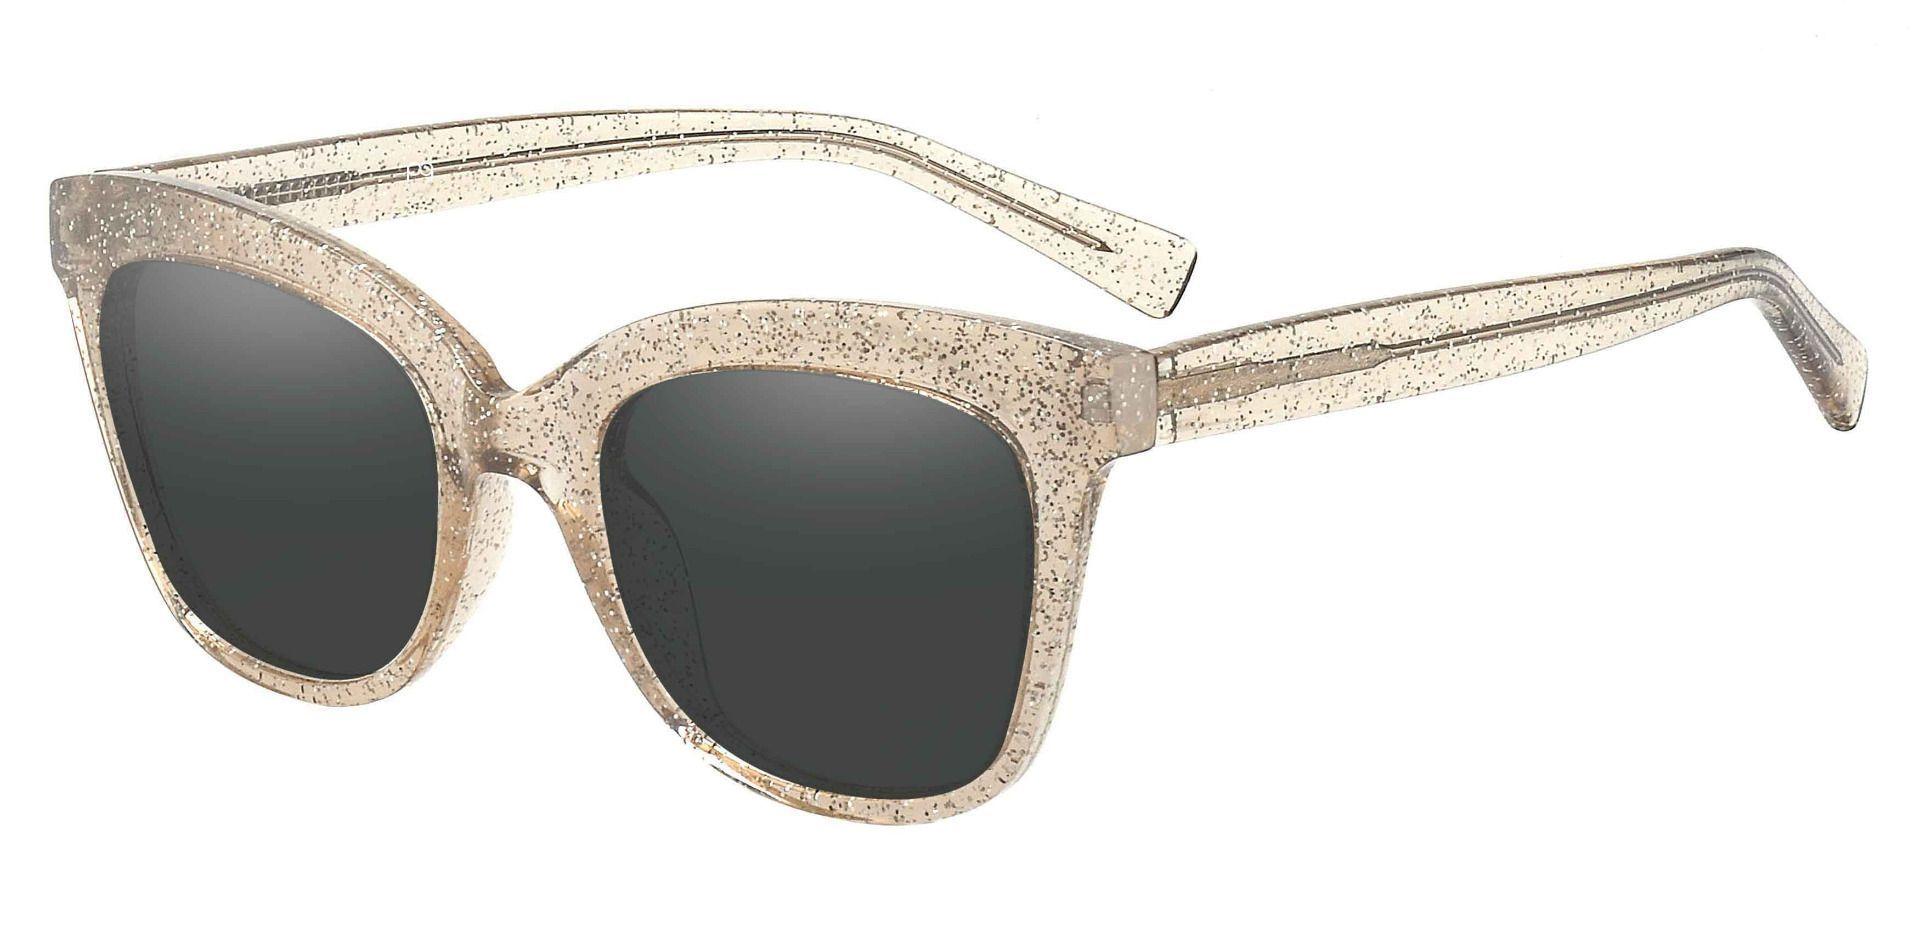 Knox Cat Eye Prescription Sunglasses - Brown Frame With Gray Lenses